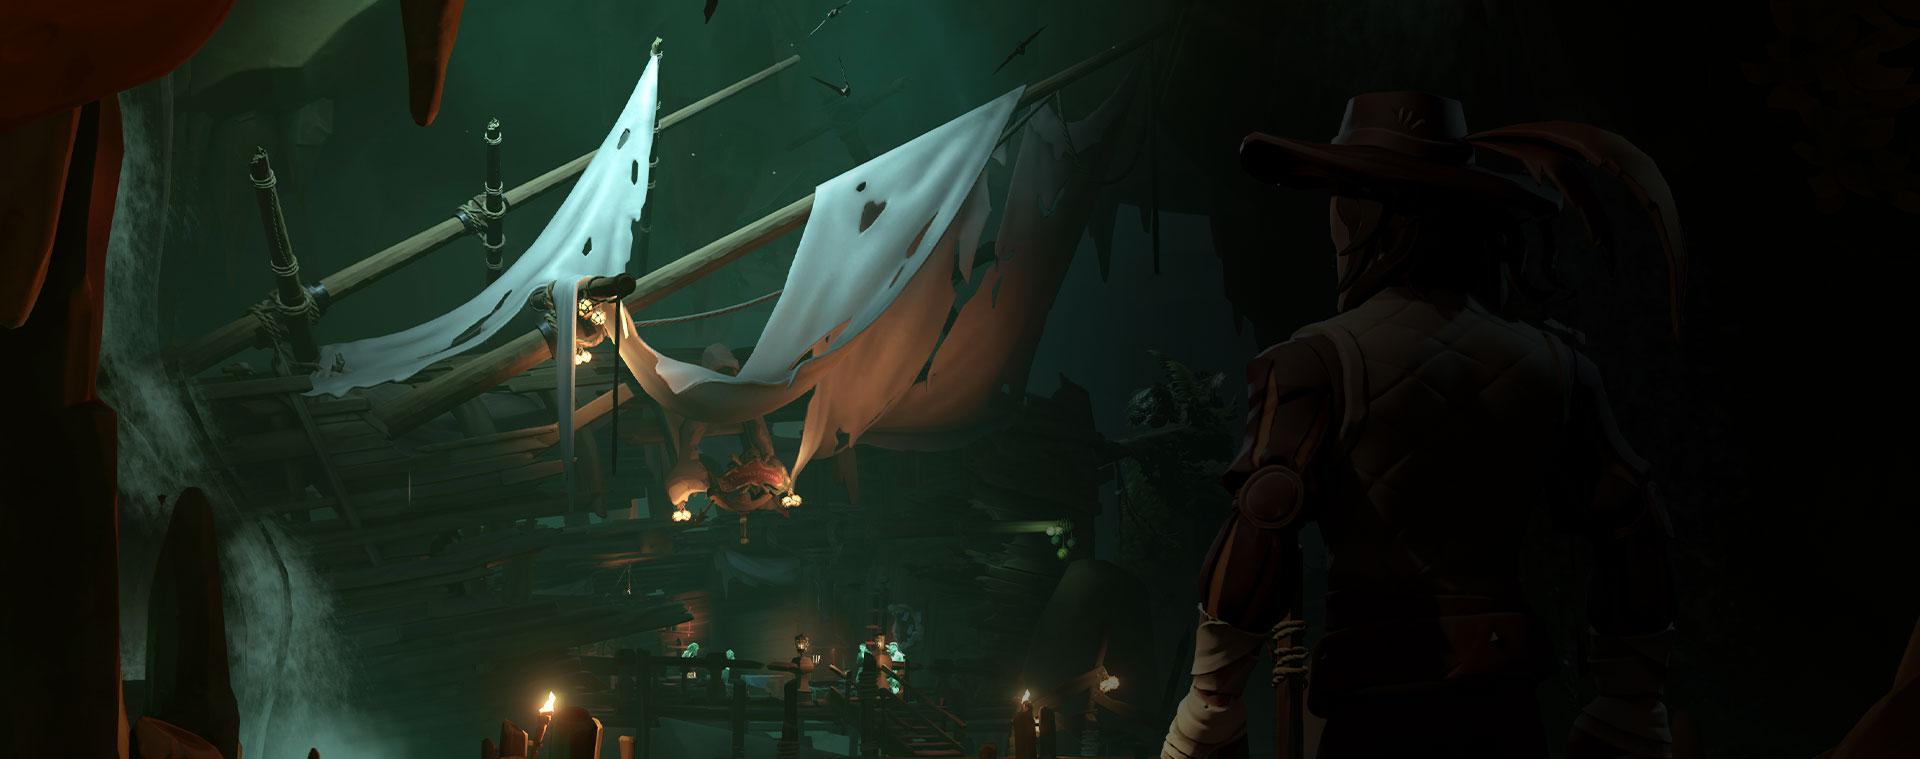 Sea of Thieves 中的角色看著遇難的船隻